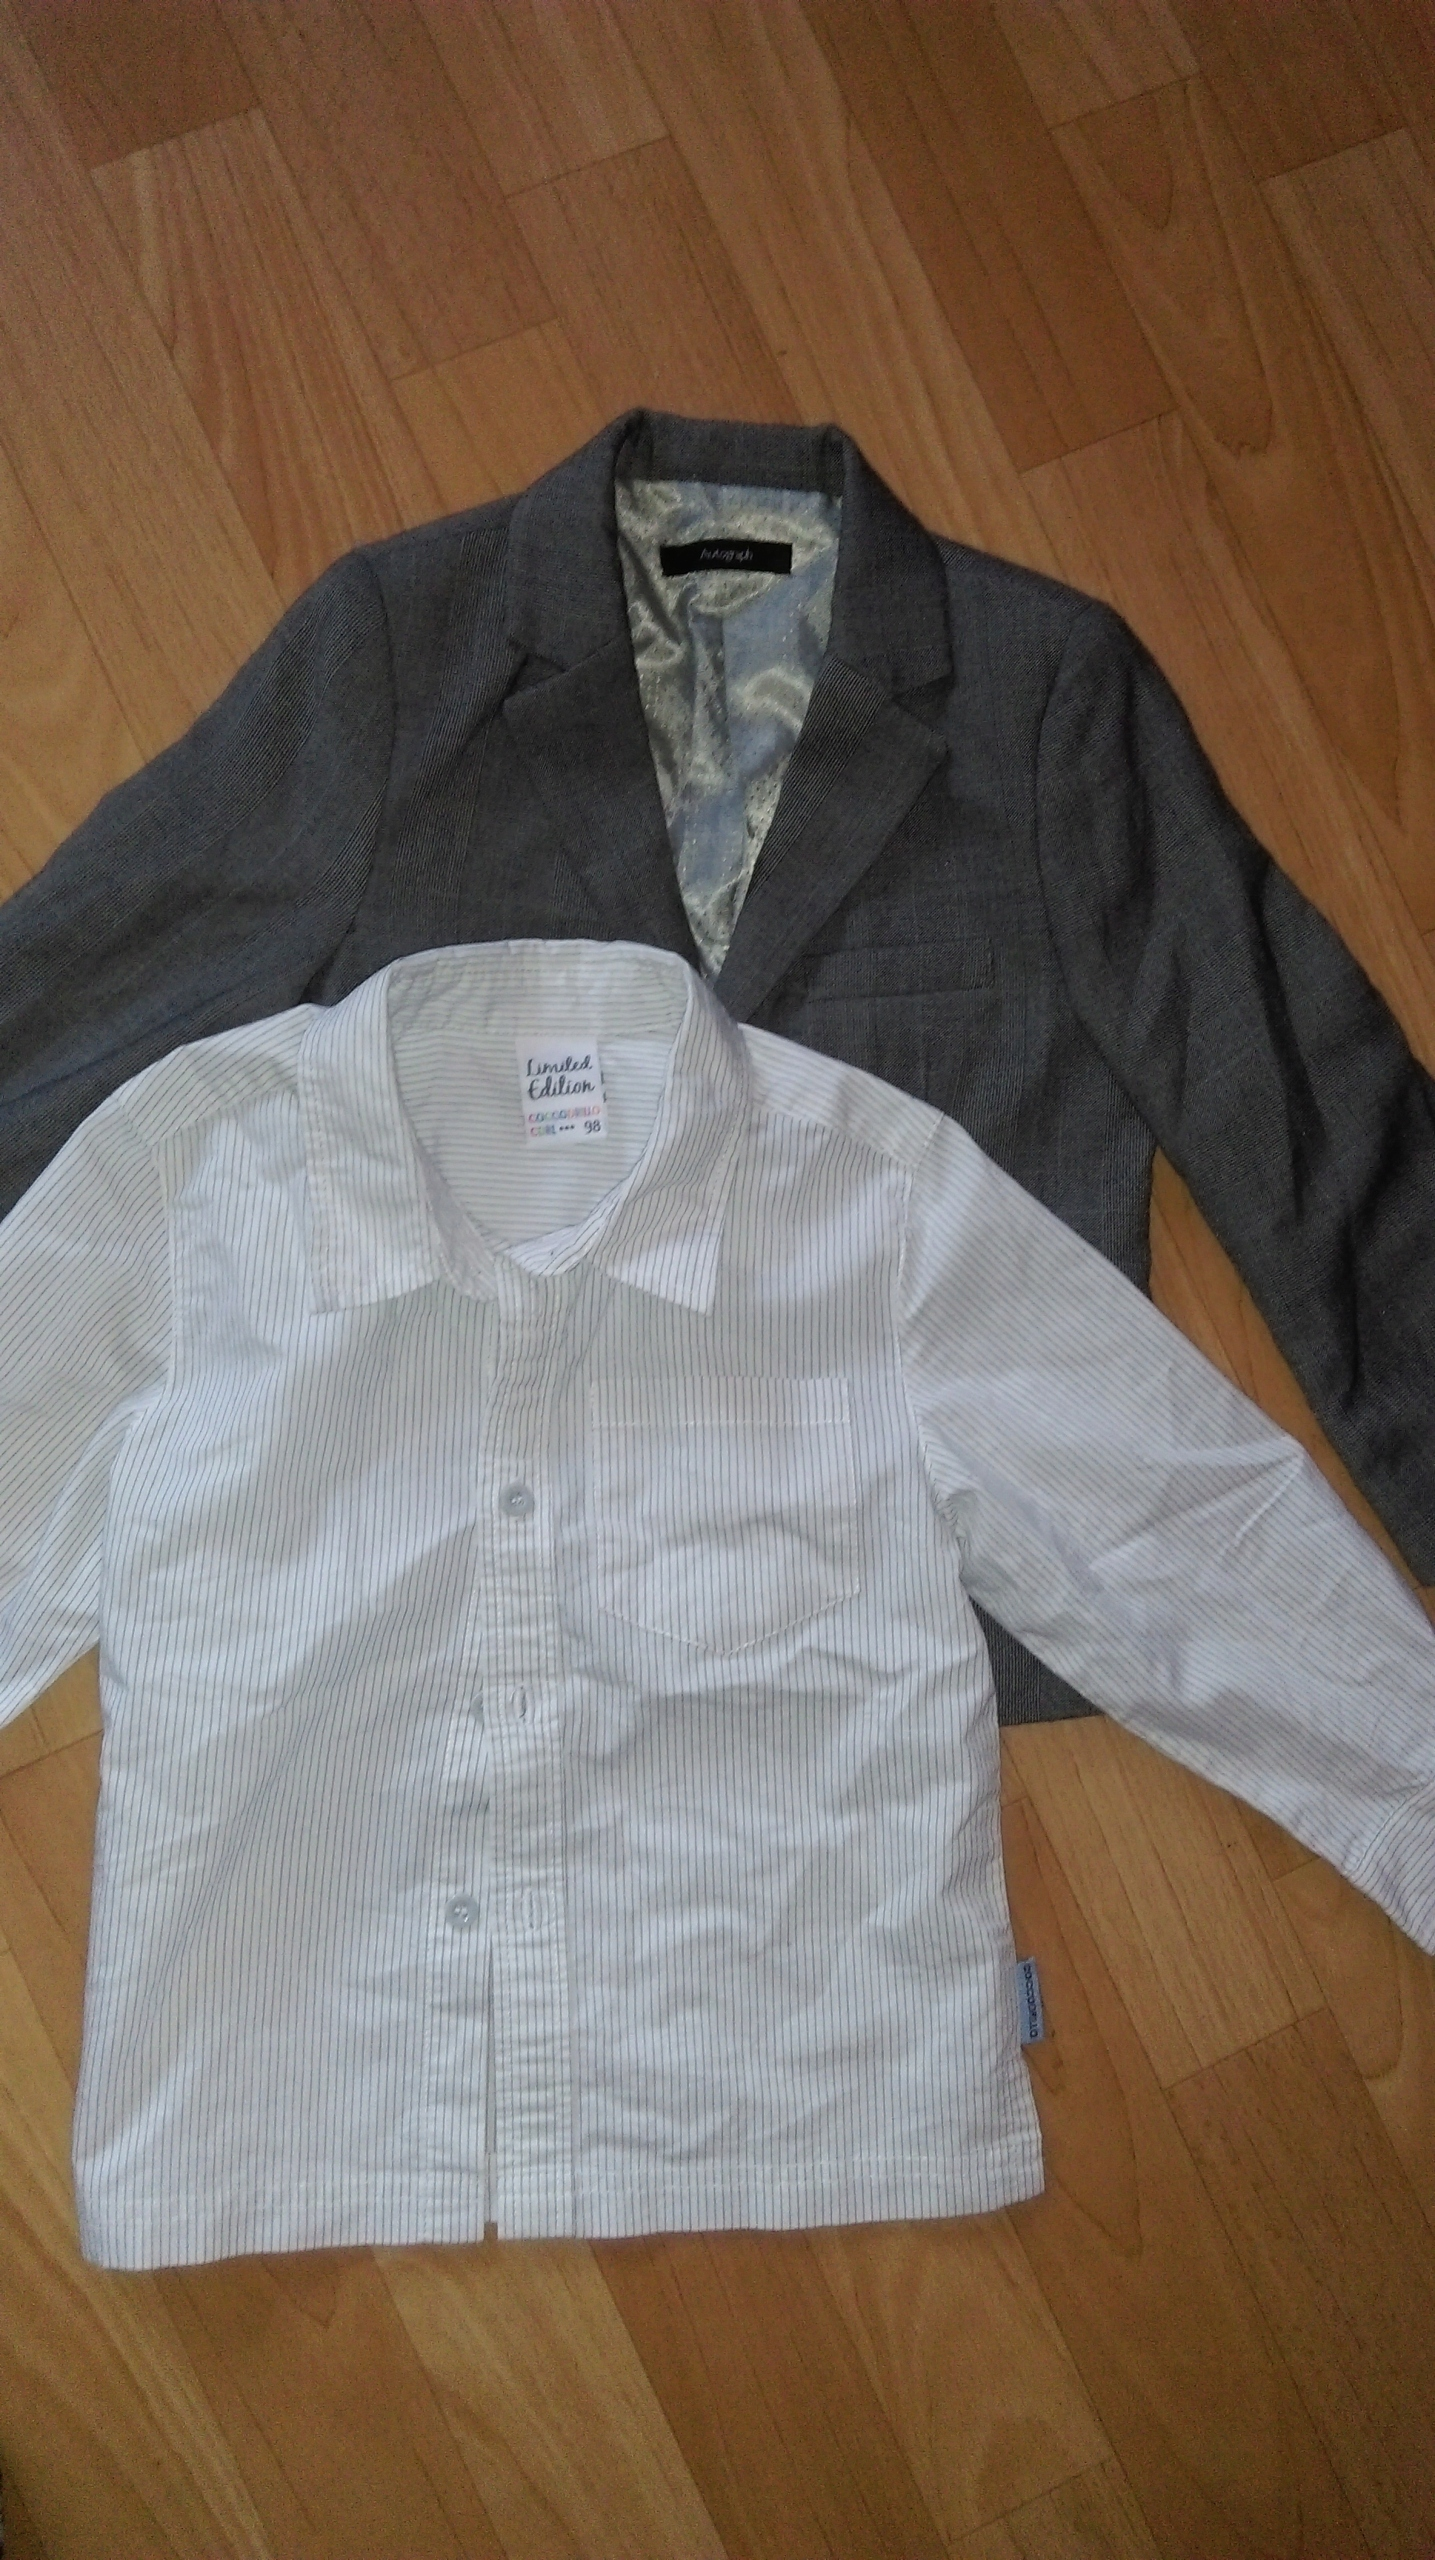 Marynarka+Coccodrillo koszula-98/104